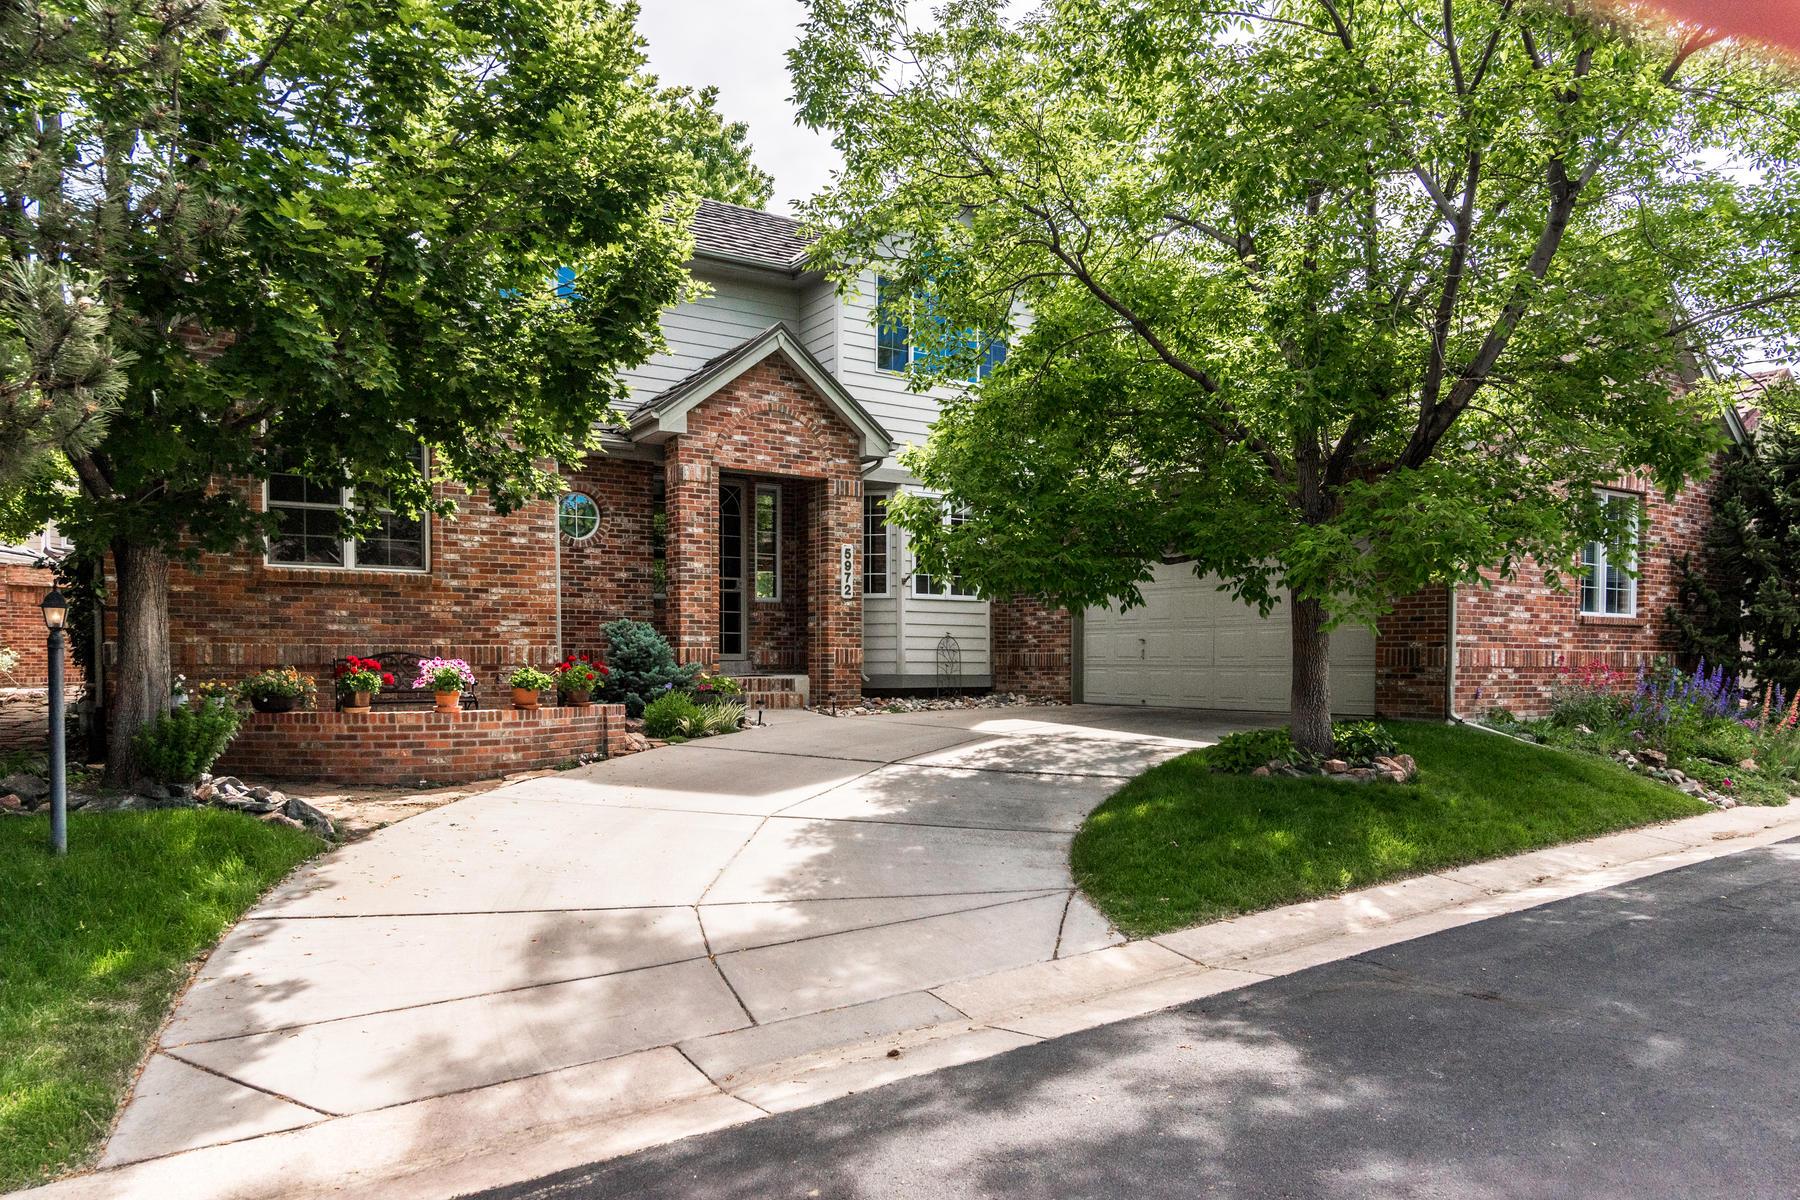 Single Family Homes για την Πώληση στο Village on the Meadow 5972 S Bellaire Way, Centennial, Κολοραντο 80121 Ηνωμένες Πολιτείες